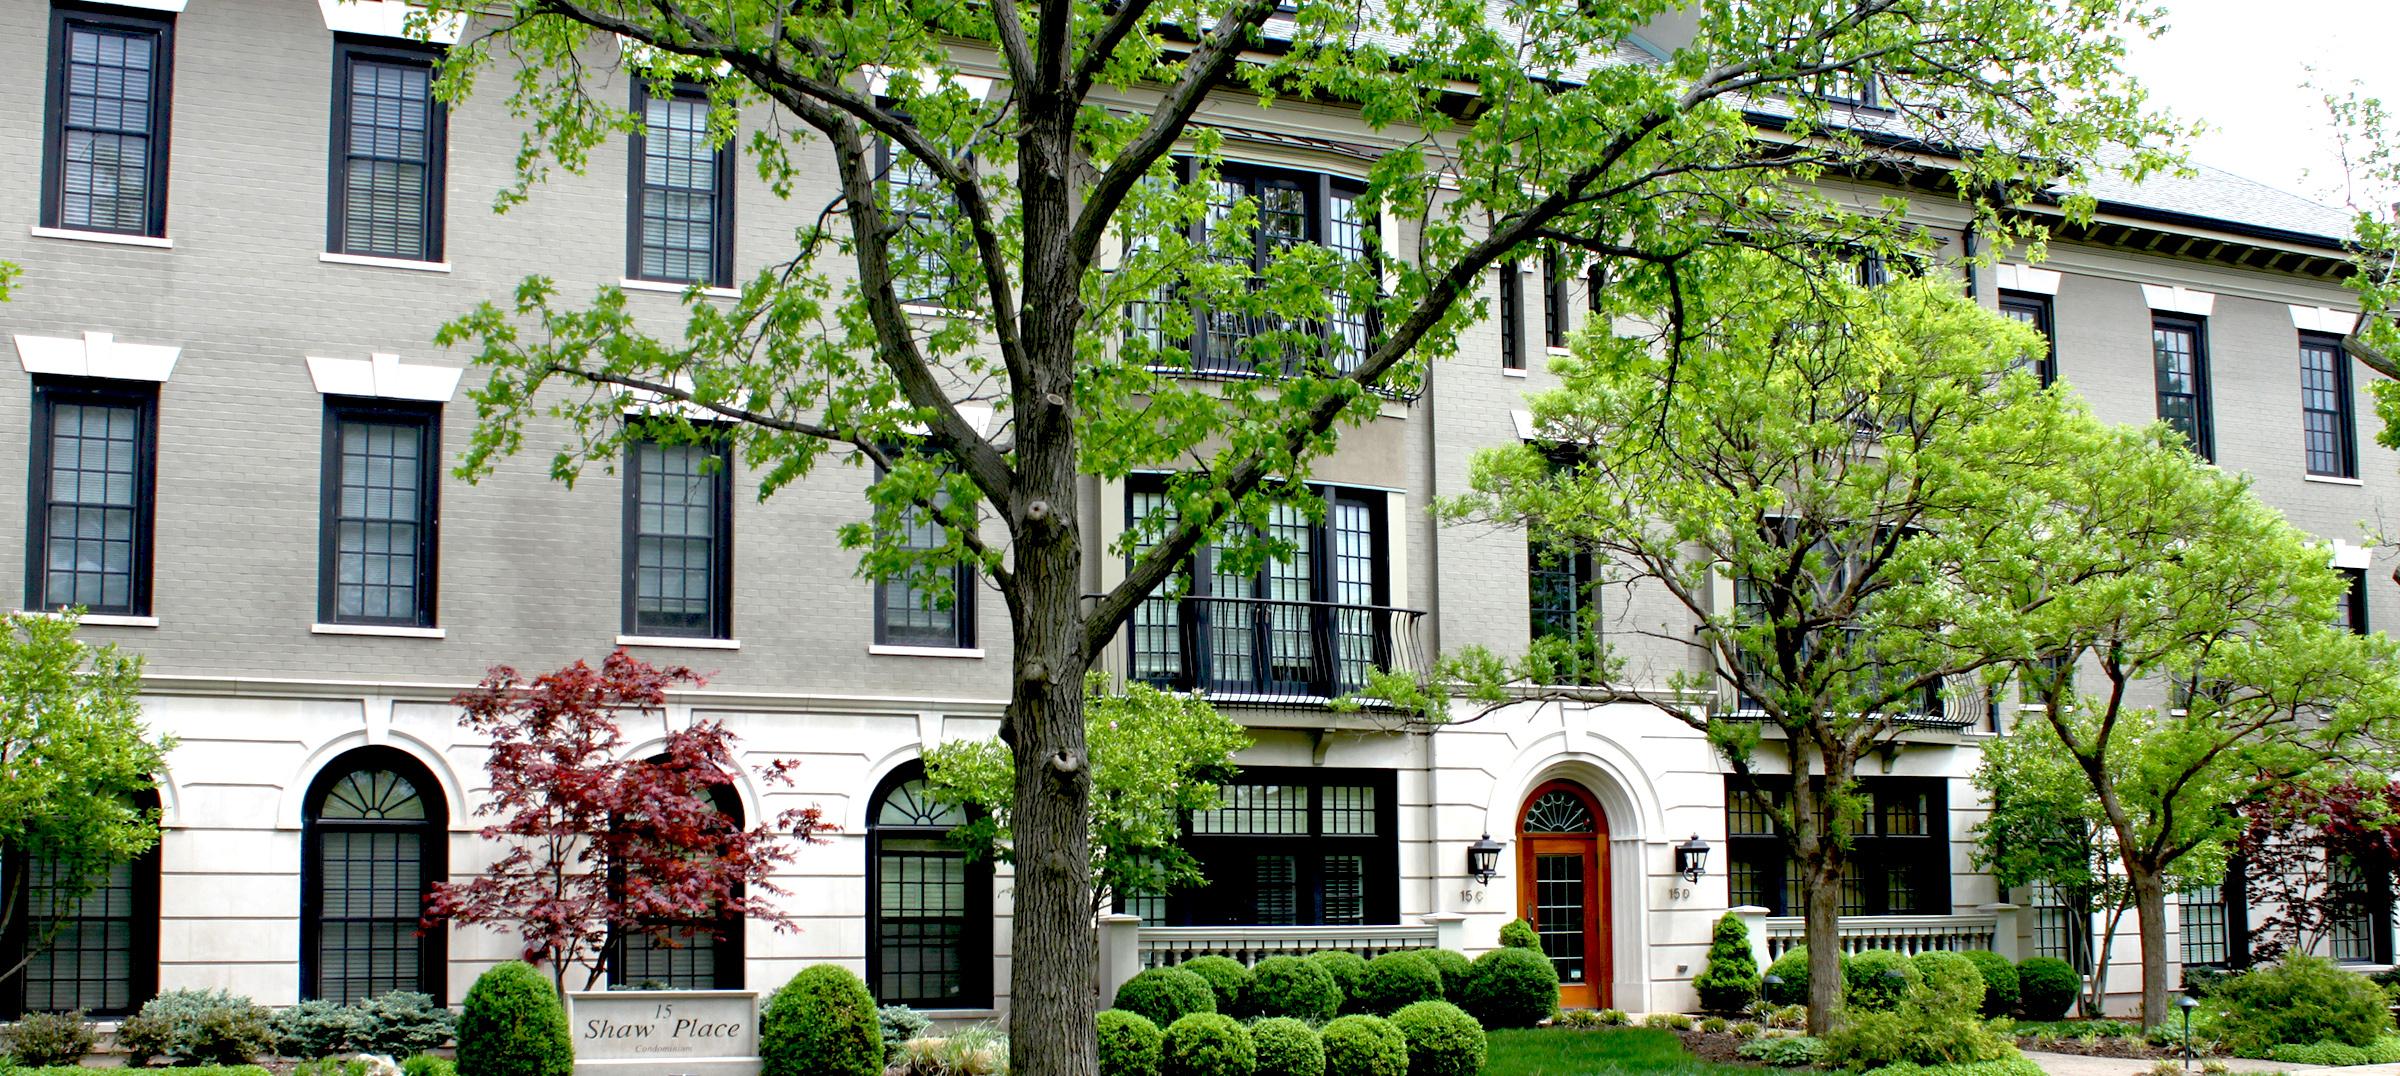 Shaw Place Condominiums - Clayton, MO